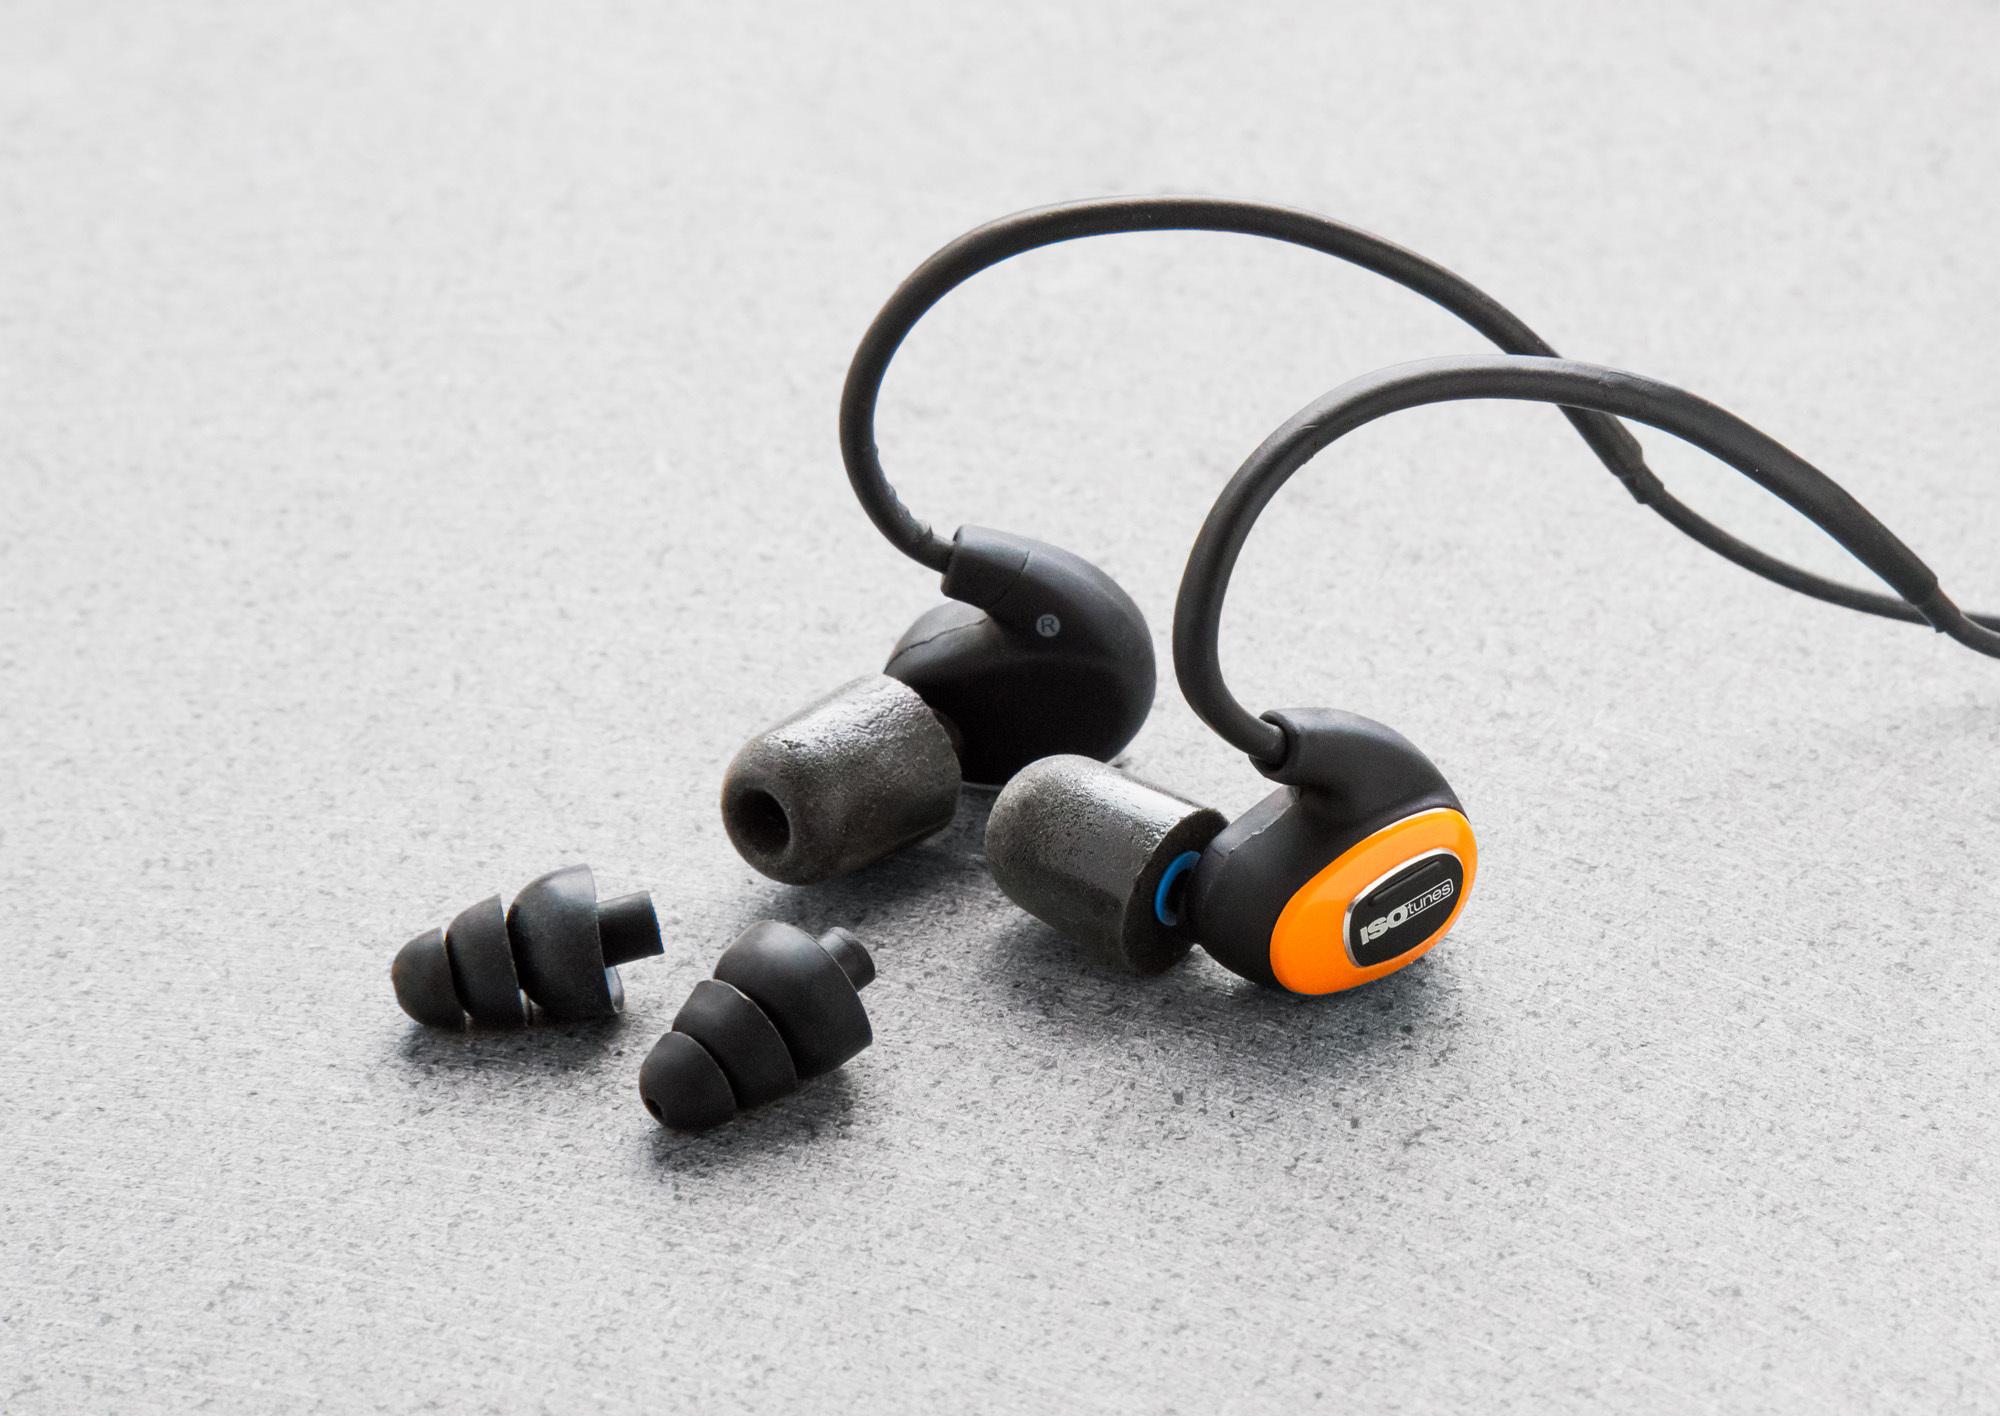 In-flight-gear-Grommet-Bluetooth-earbuds.jpg?mtime=20190227152748#asset:105008